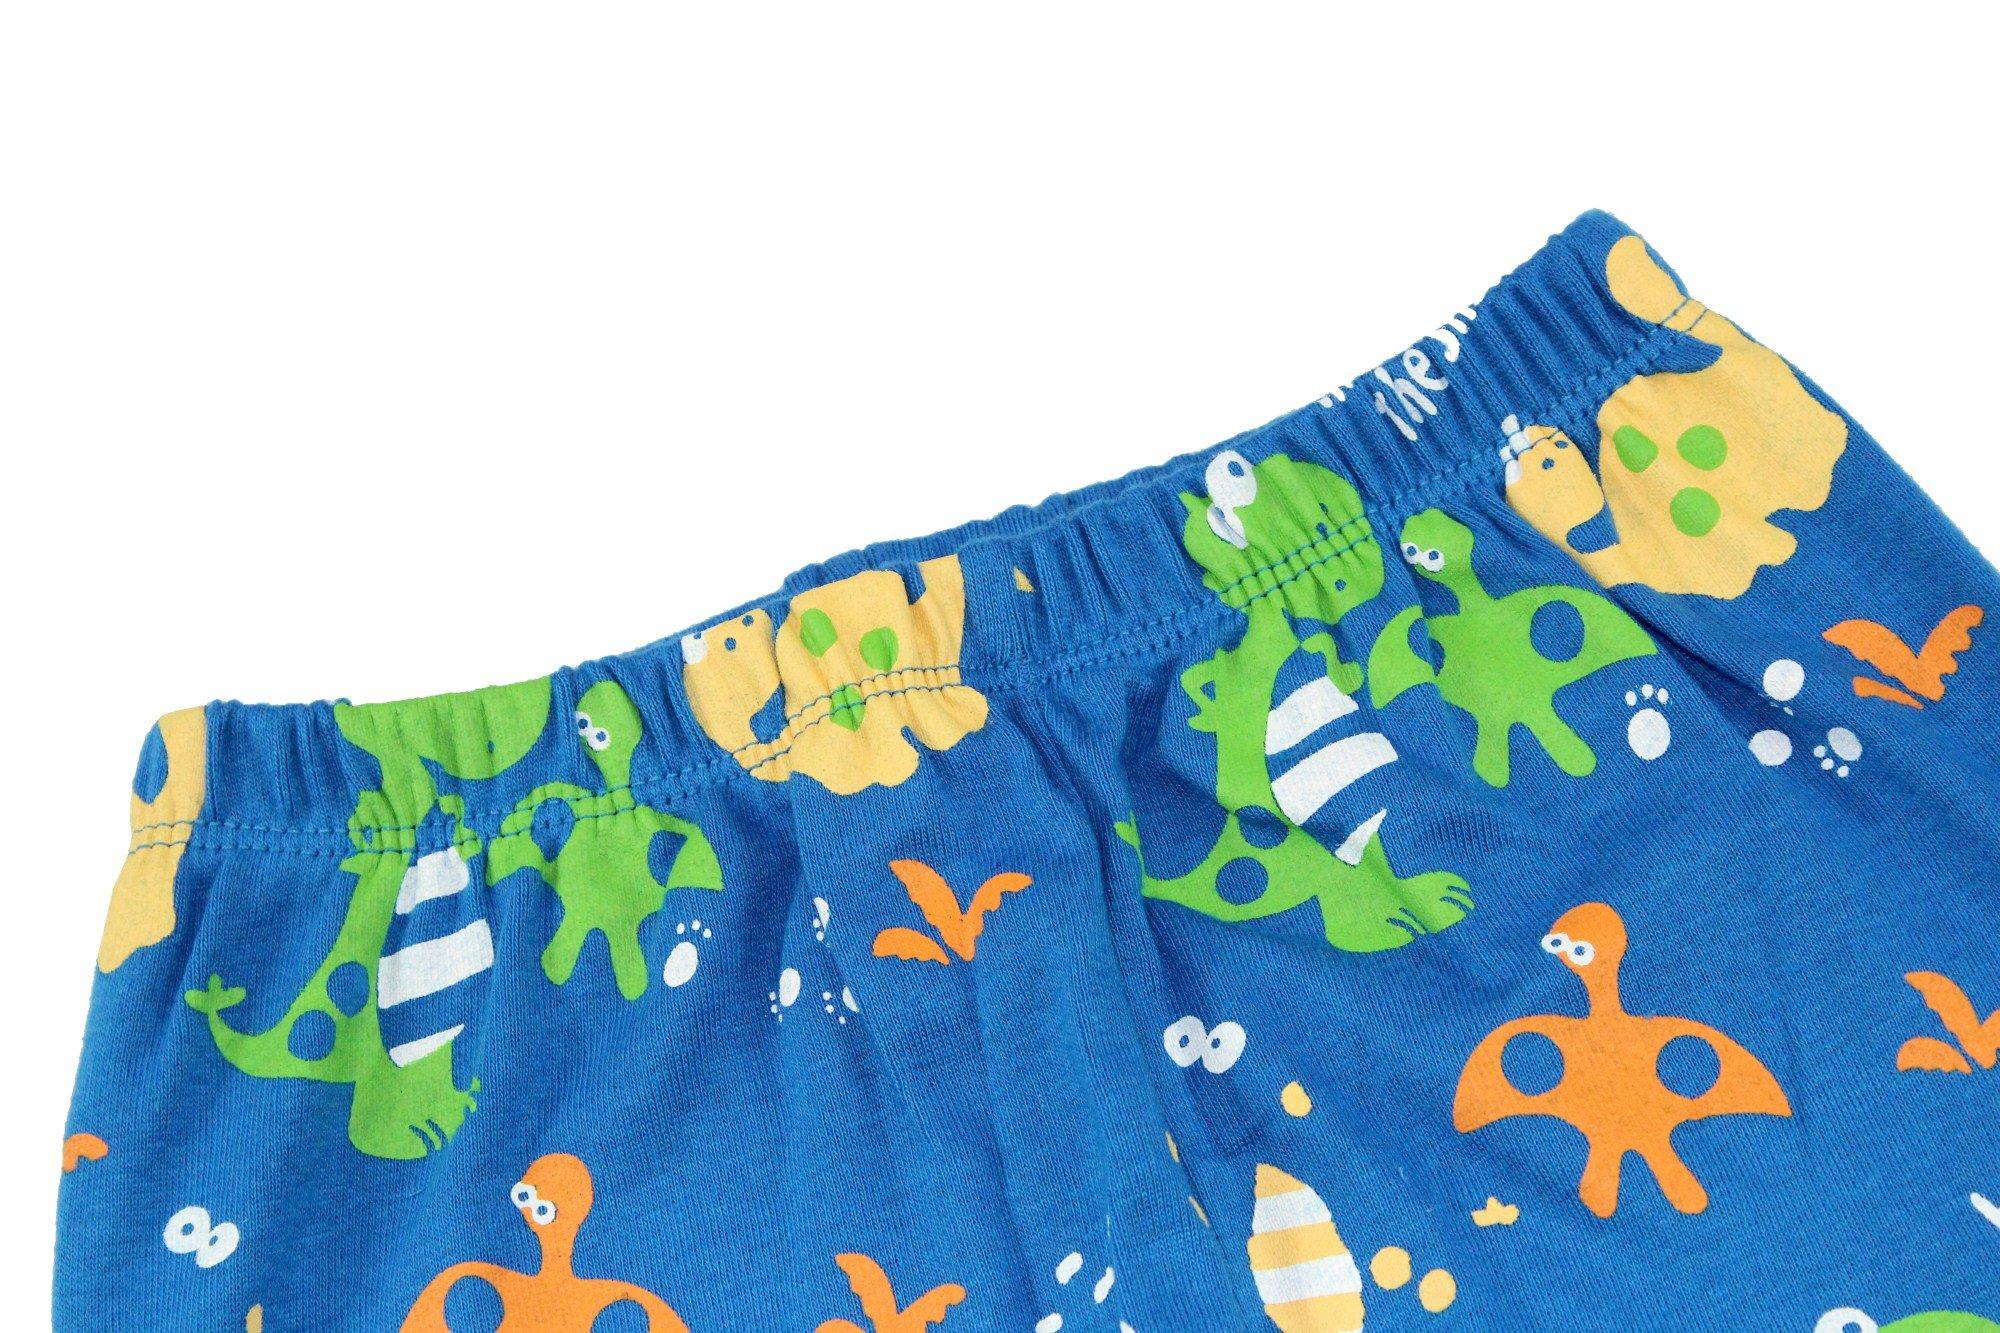 Boys Pajamas Boys Dinosaur Little Kid Shorts Set 100% Cotton Clothes Short Sleeves Sleepwear 8Y by shelry (Image #9)